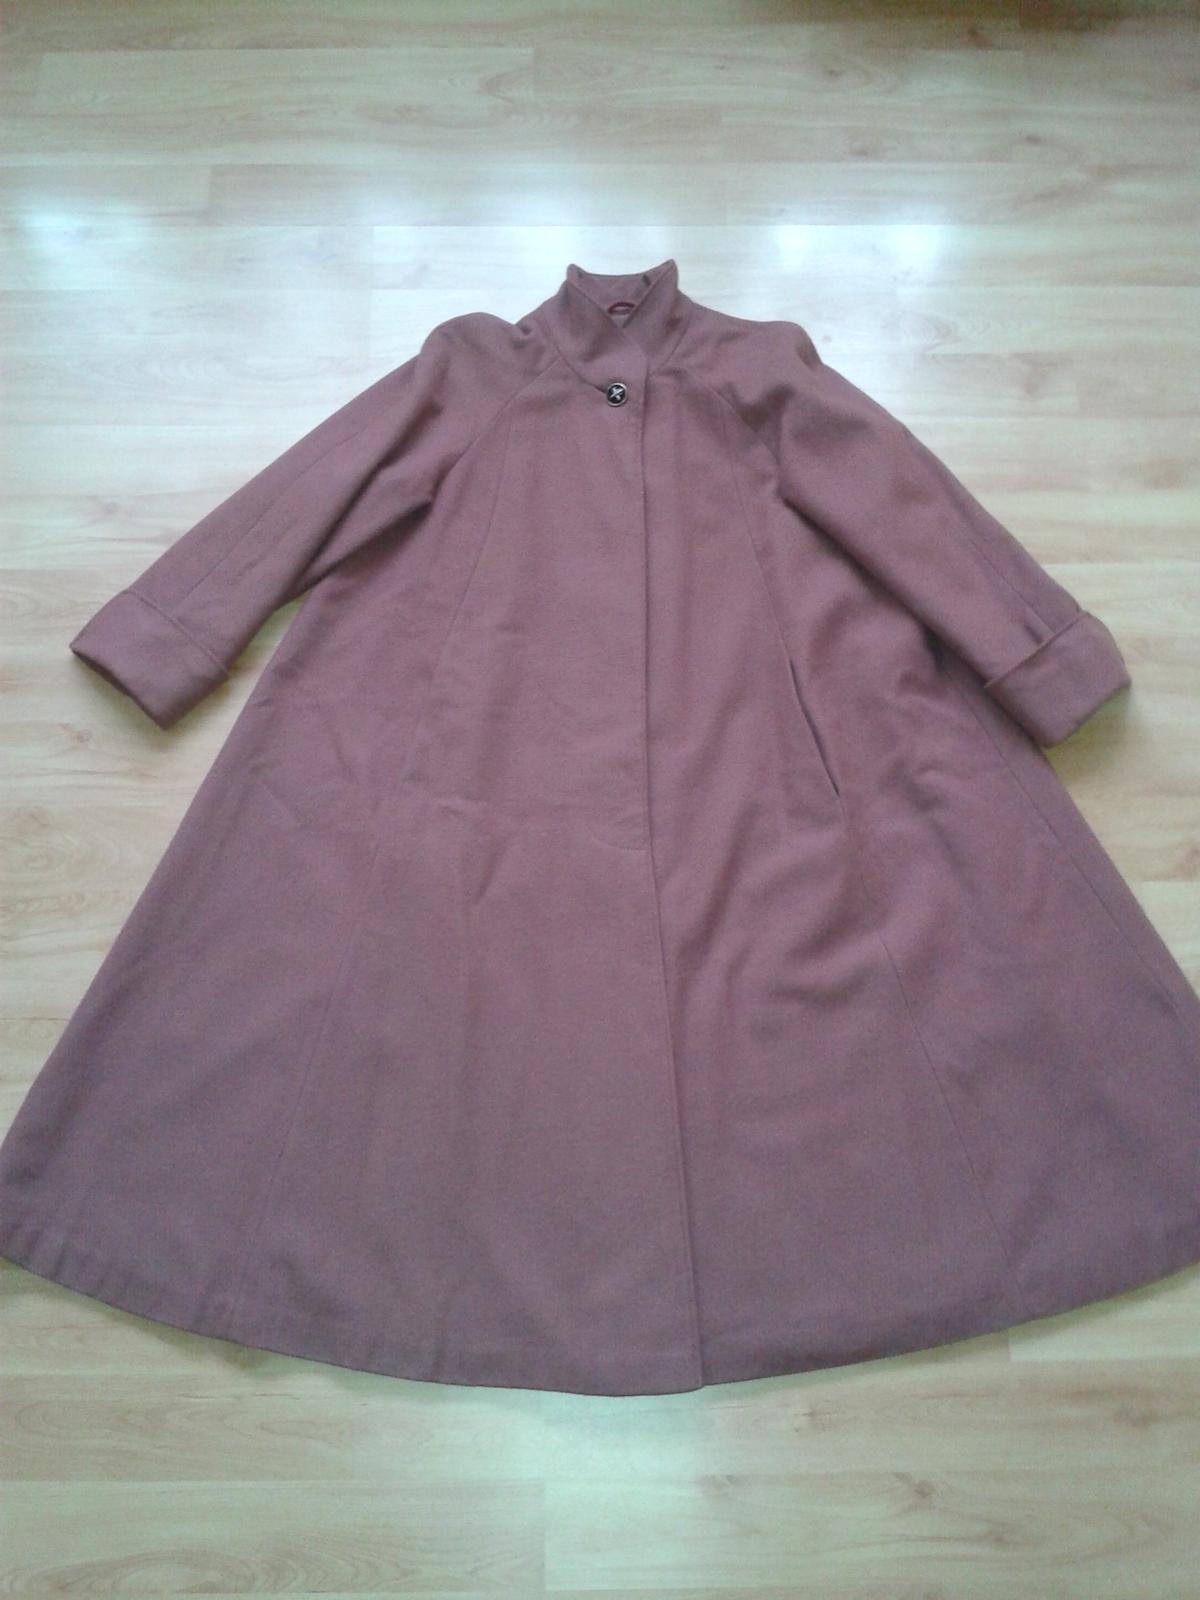 Dámsky balónový kabát - Obrázok č. 1